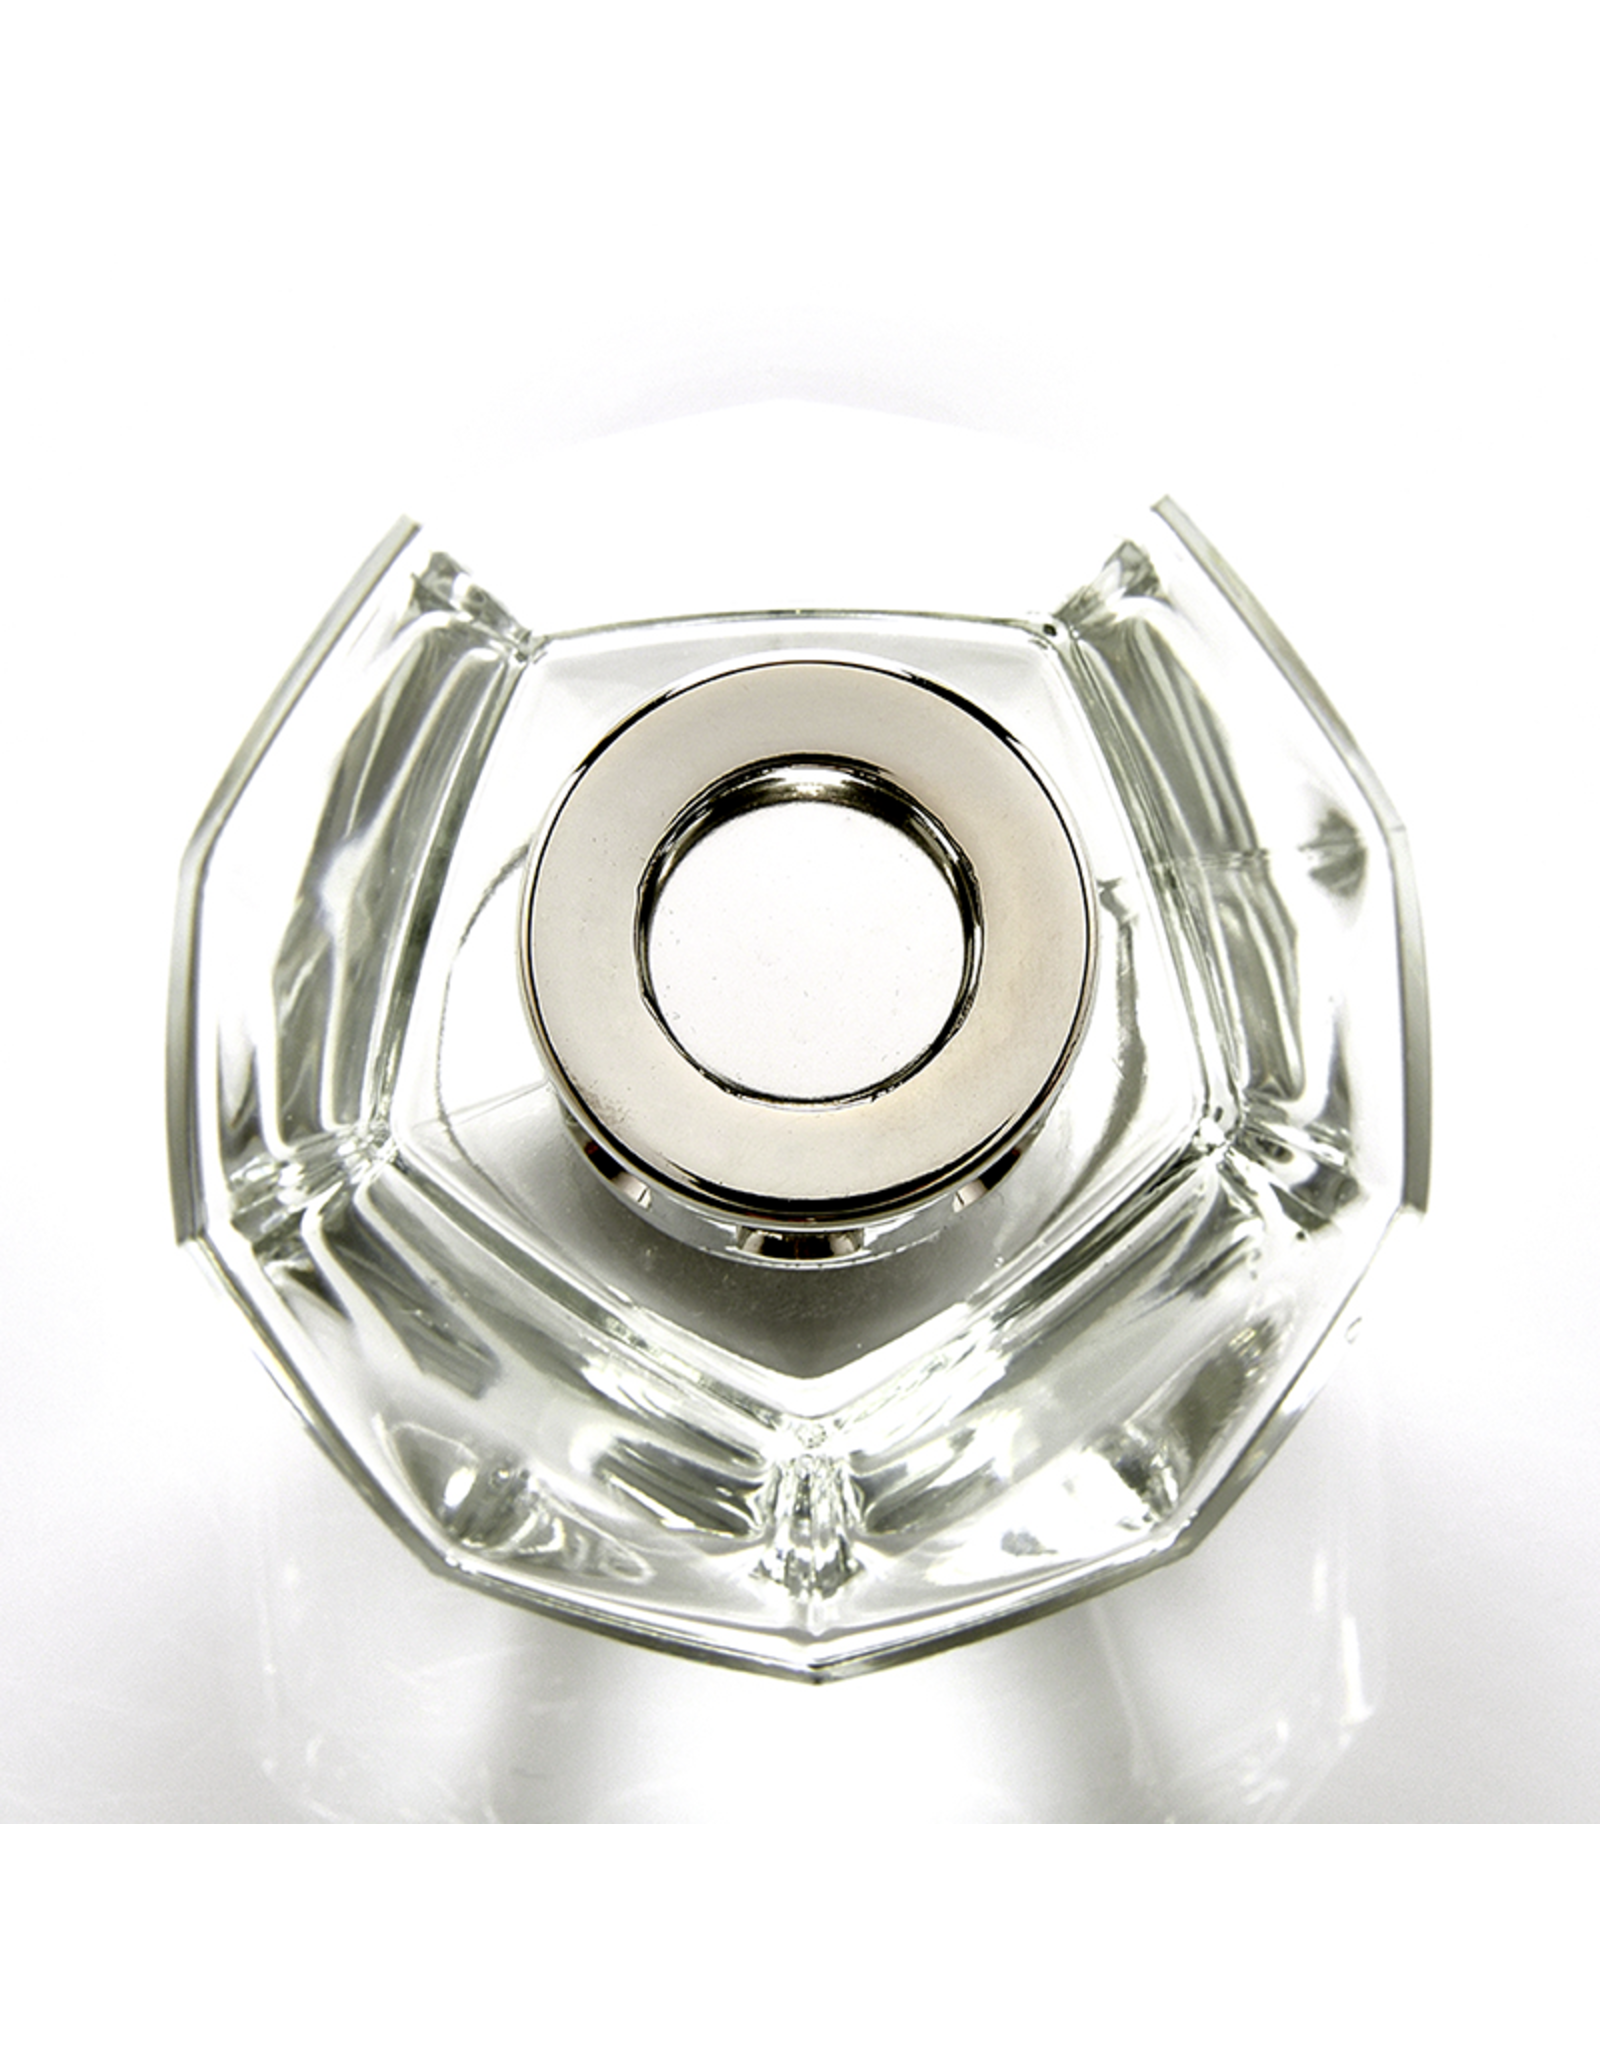 Lampe Berger Geurbrander Giftbox - Geometry Transparante